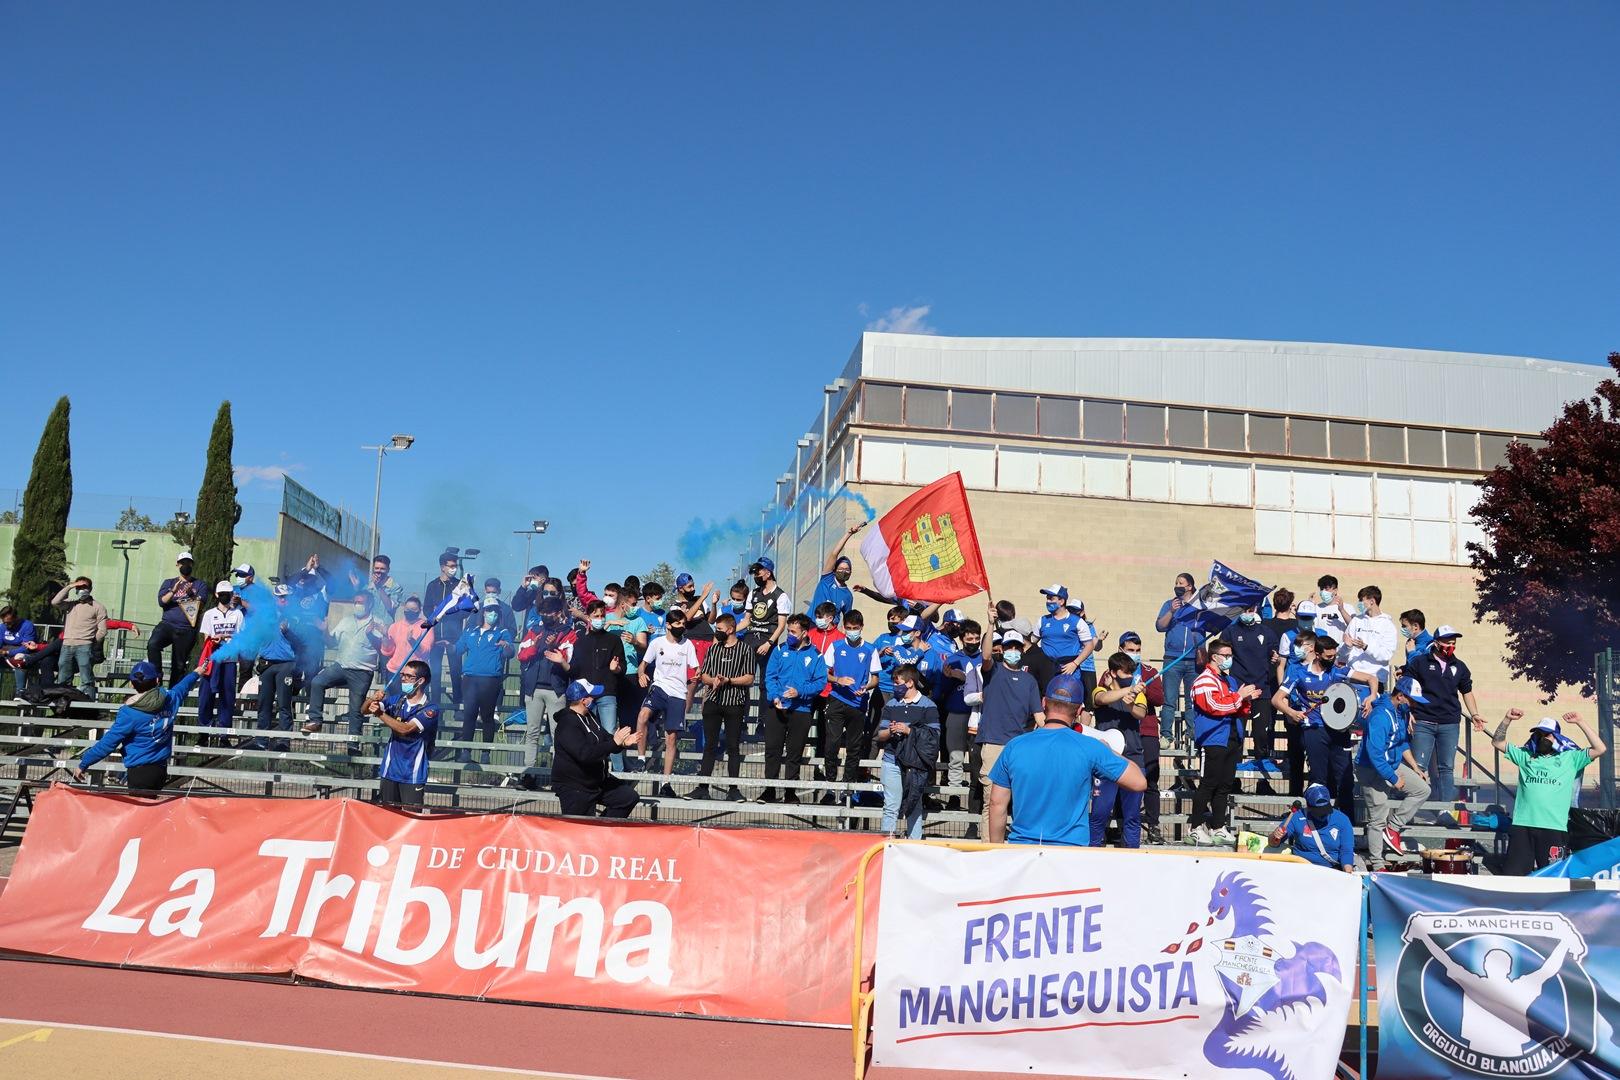 Orgullo Blanquiazul acompañó al equipo hasta Guadalajara